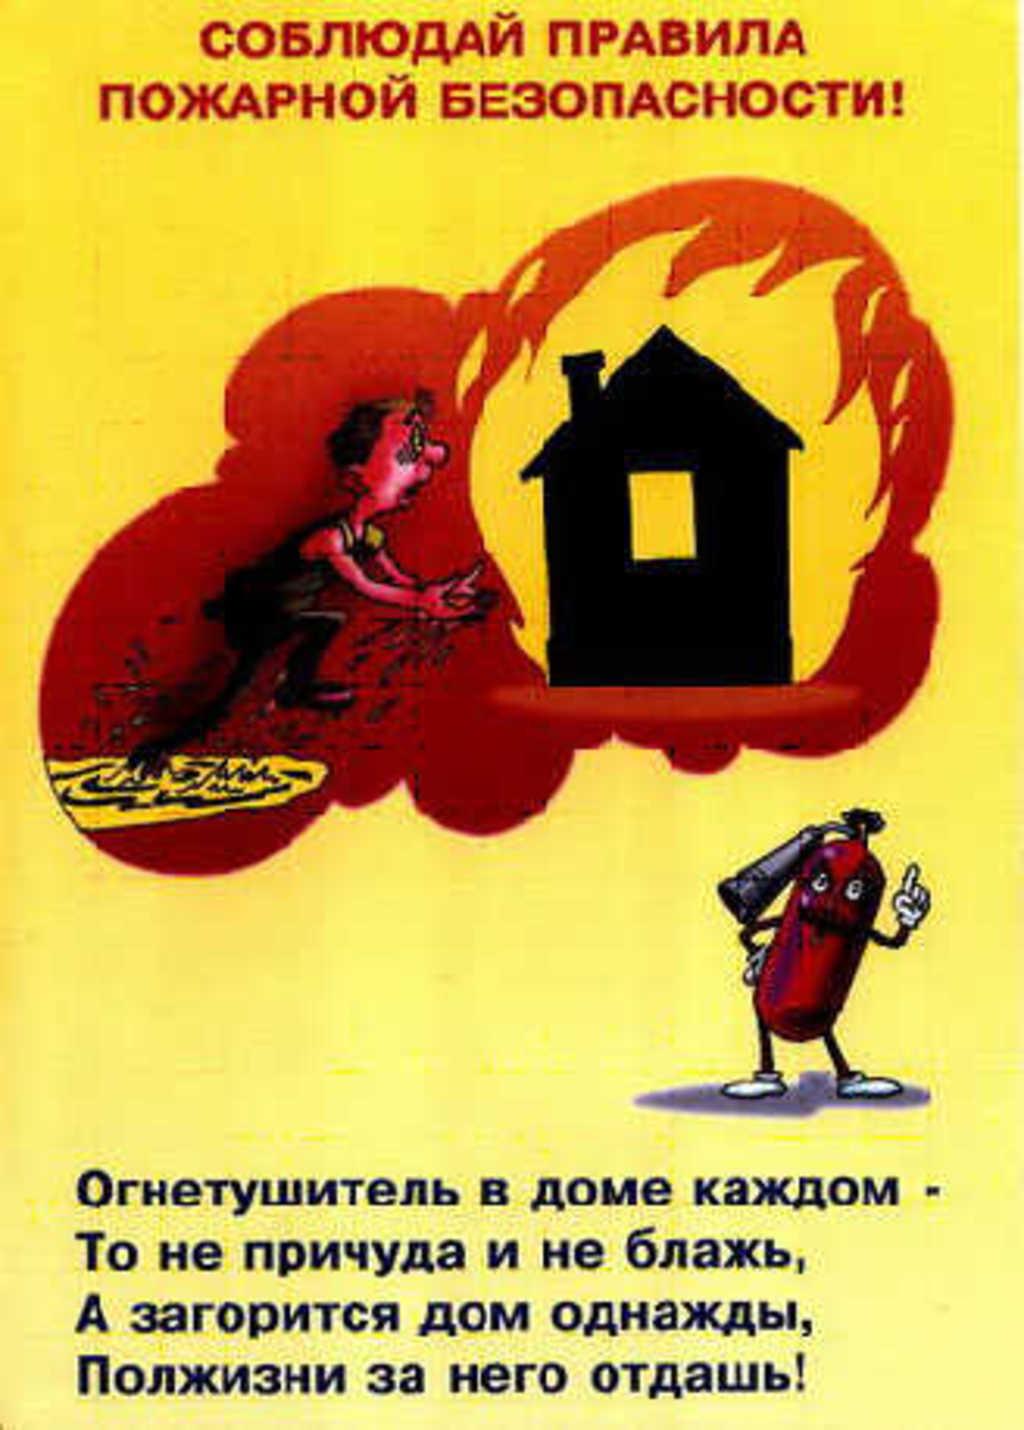 РИСУНКИ КАРАНДАШОМ БОРОДИНСКОЕ ...: pictures11.ru/risunki-karandashom-borodinskoe-srazhenie.html